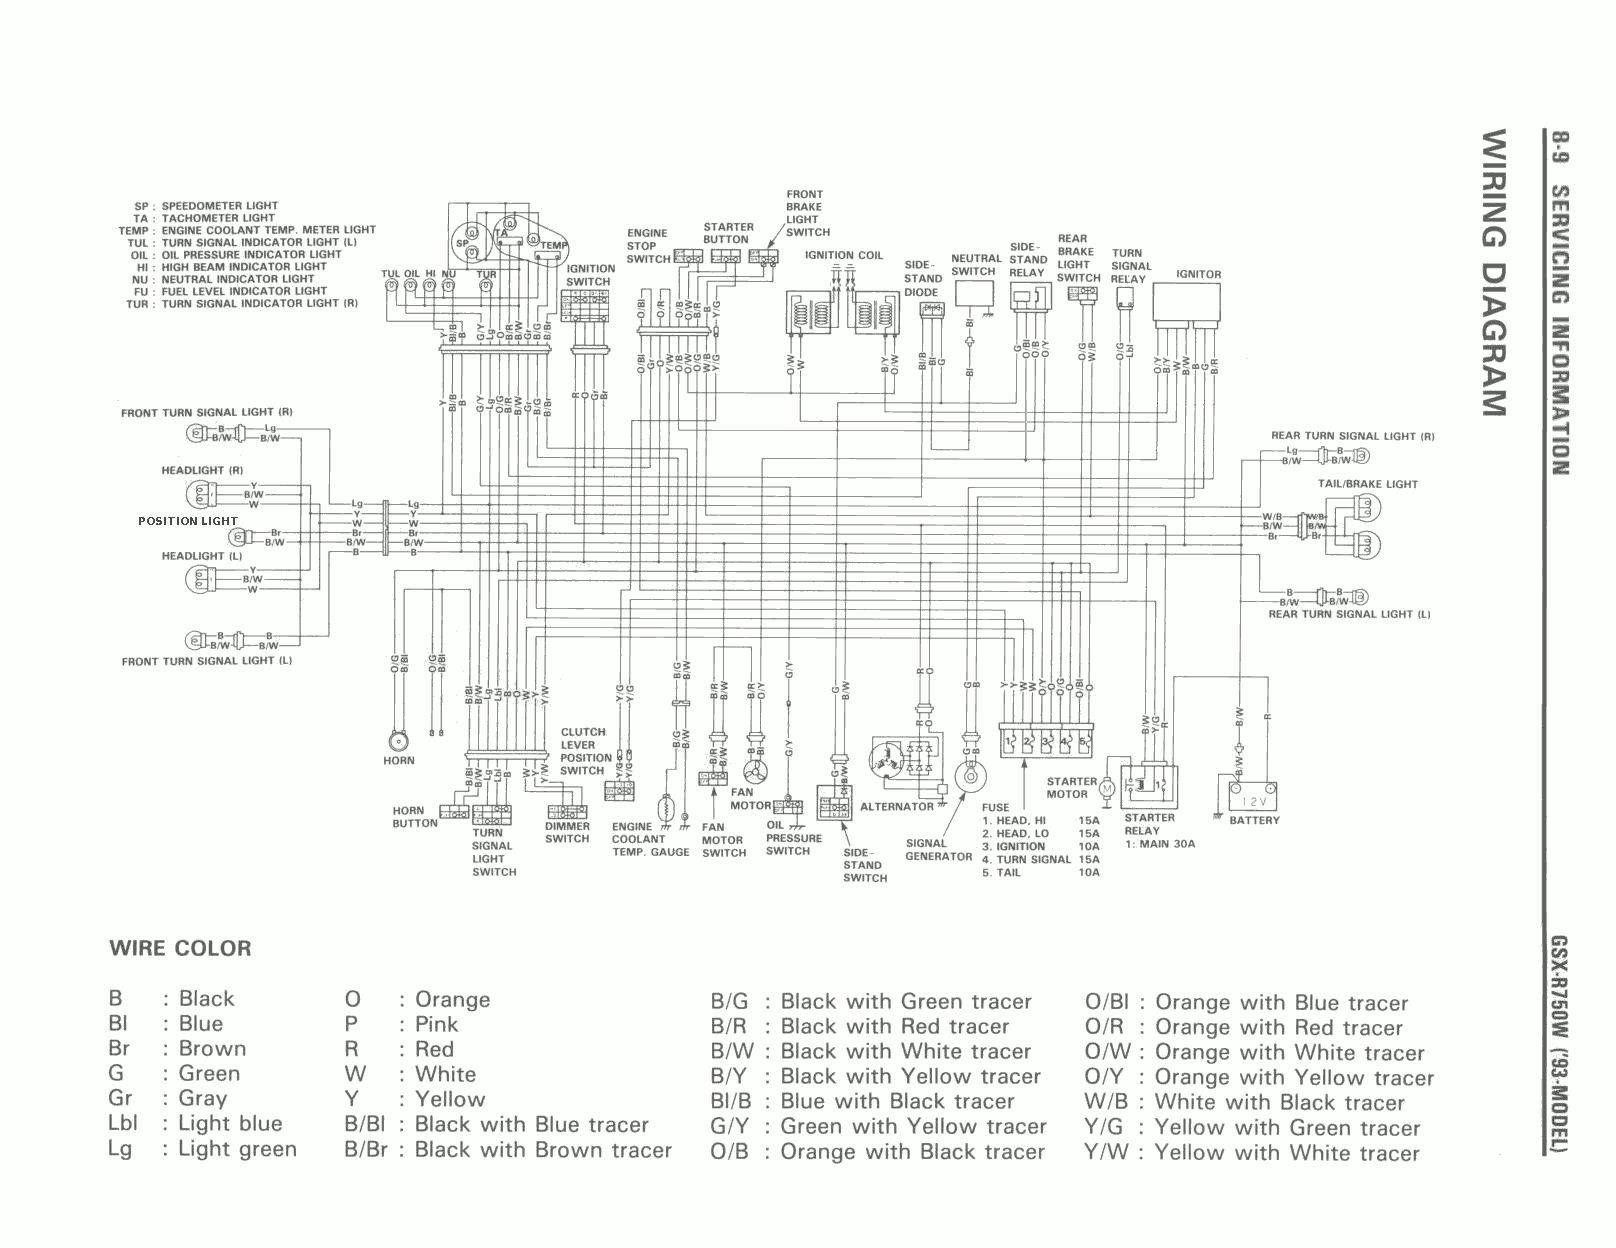 85 Ski Doo Wiring Diagram Trusted Schematics 1989 Sea 77 Blizzard